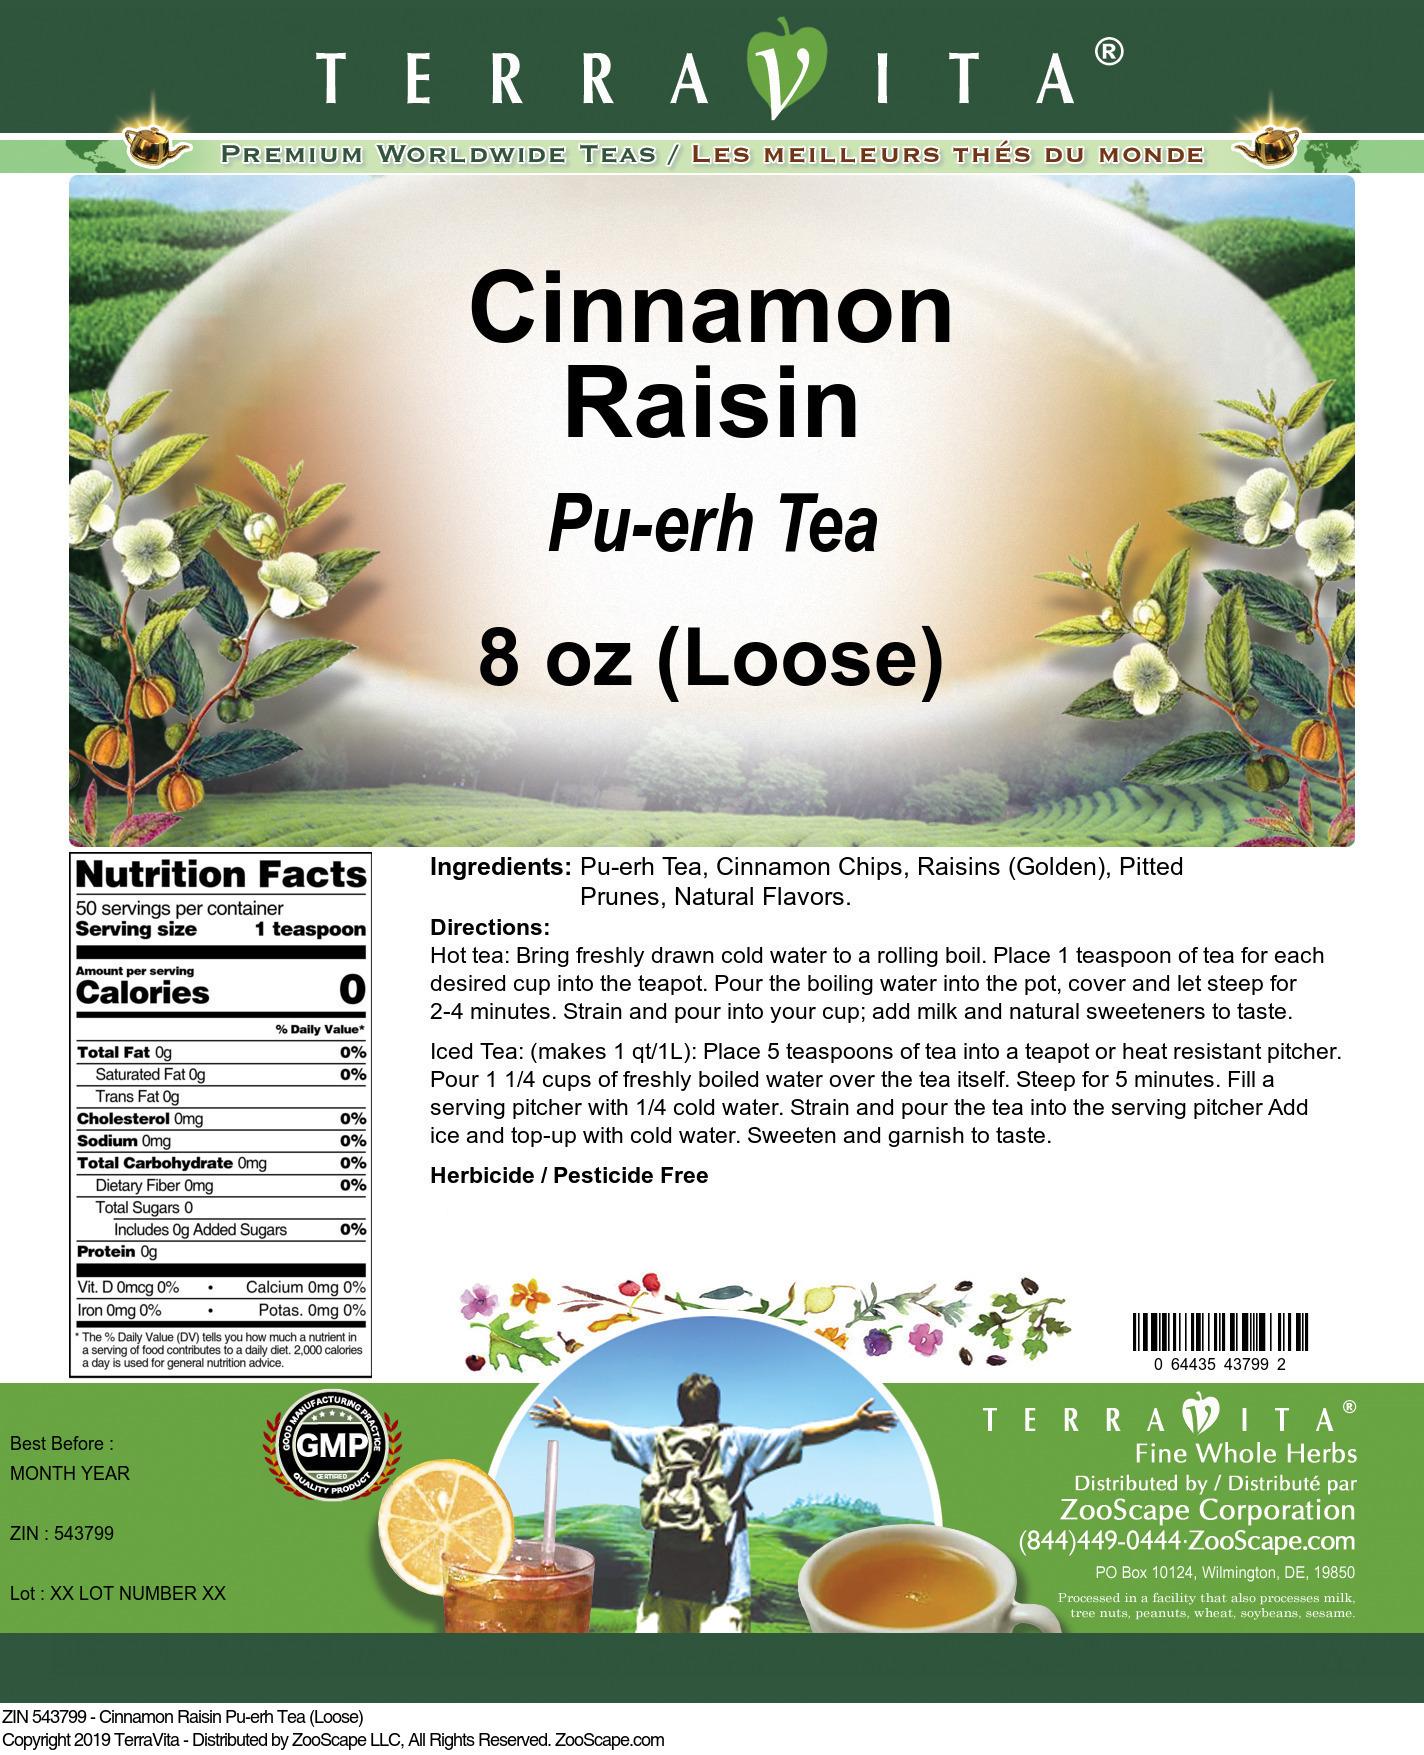 Cinnamon Raisin Pu-erh Tea (Loose)